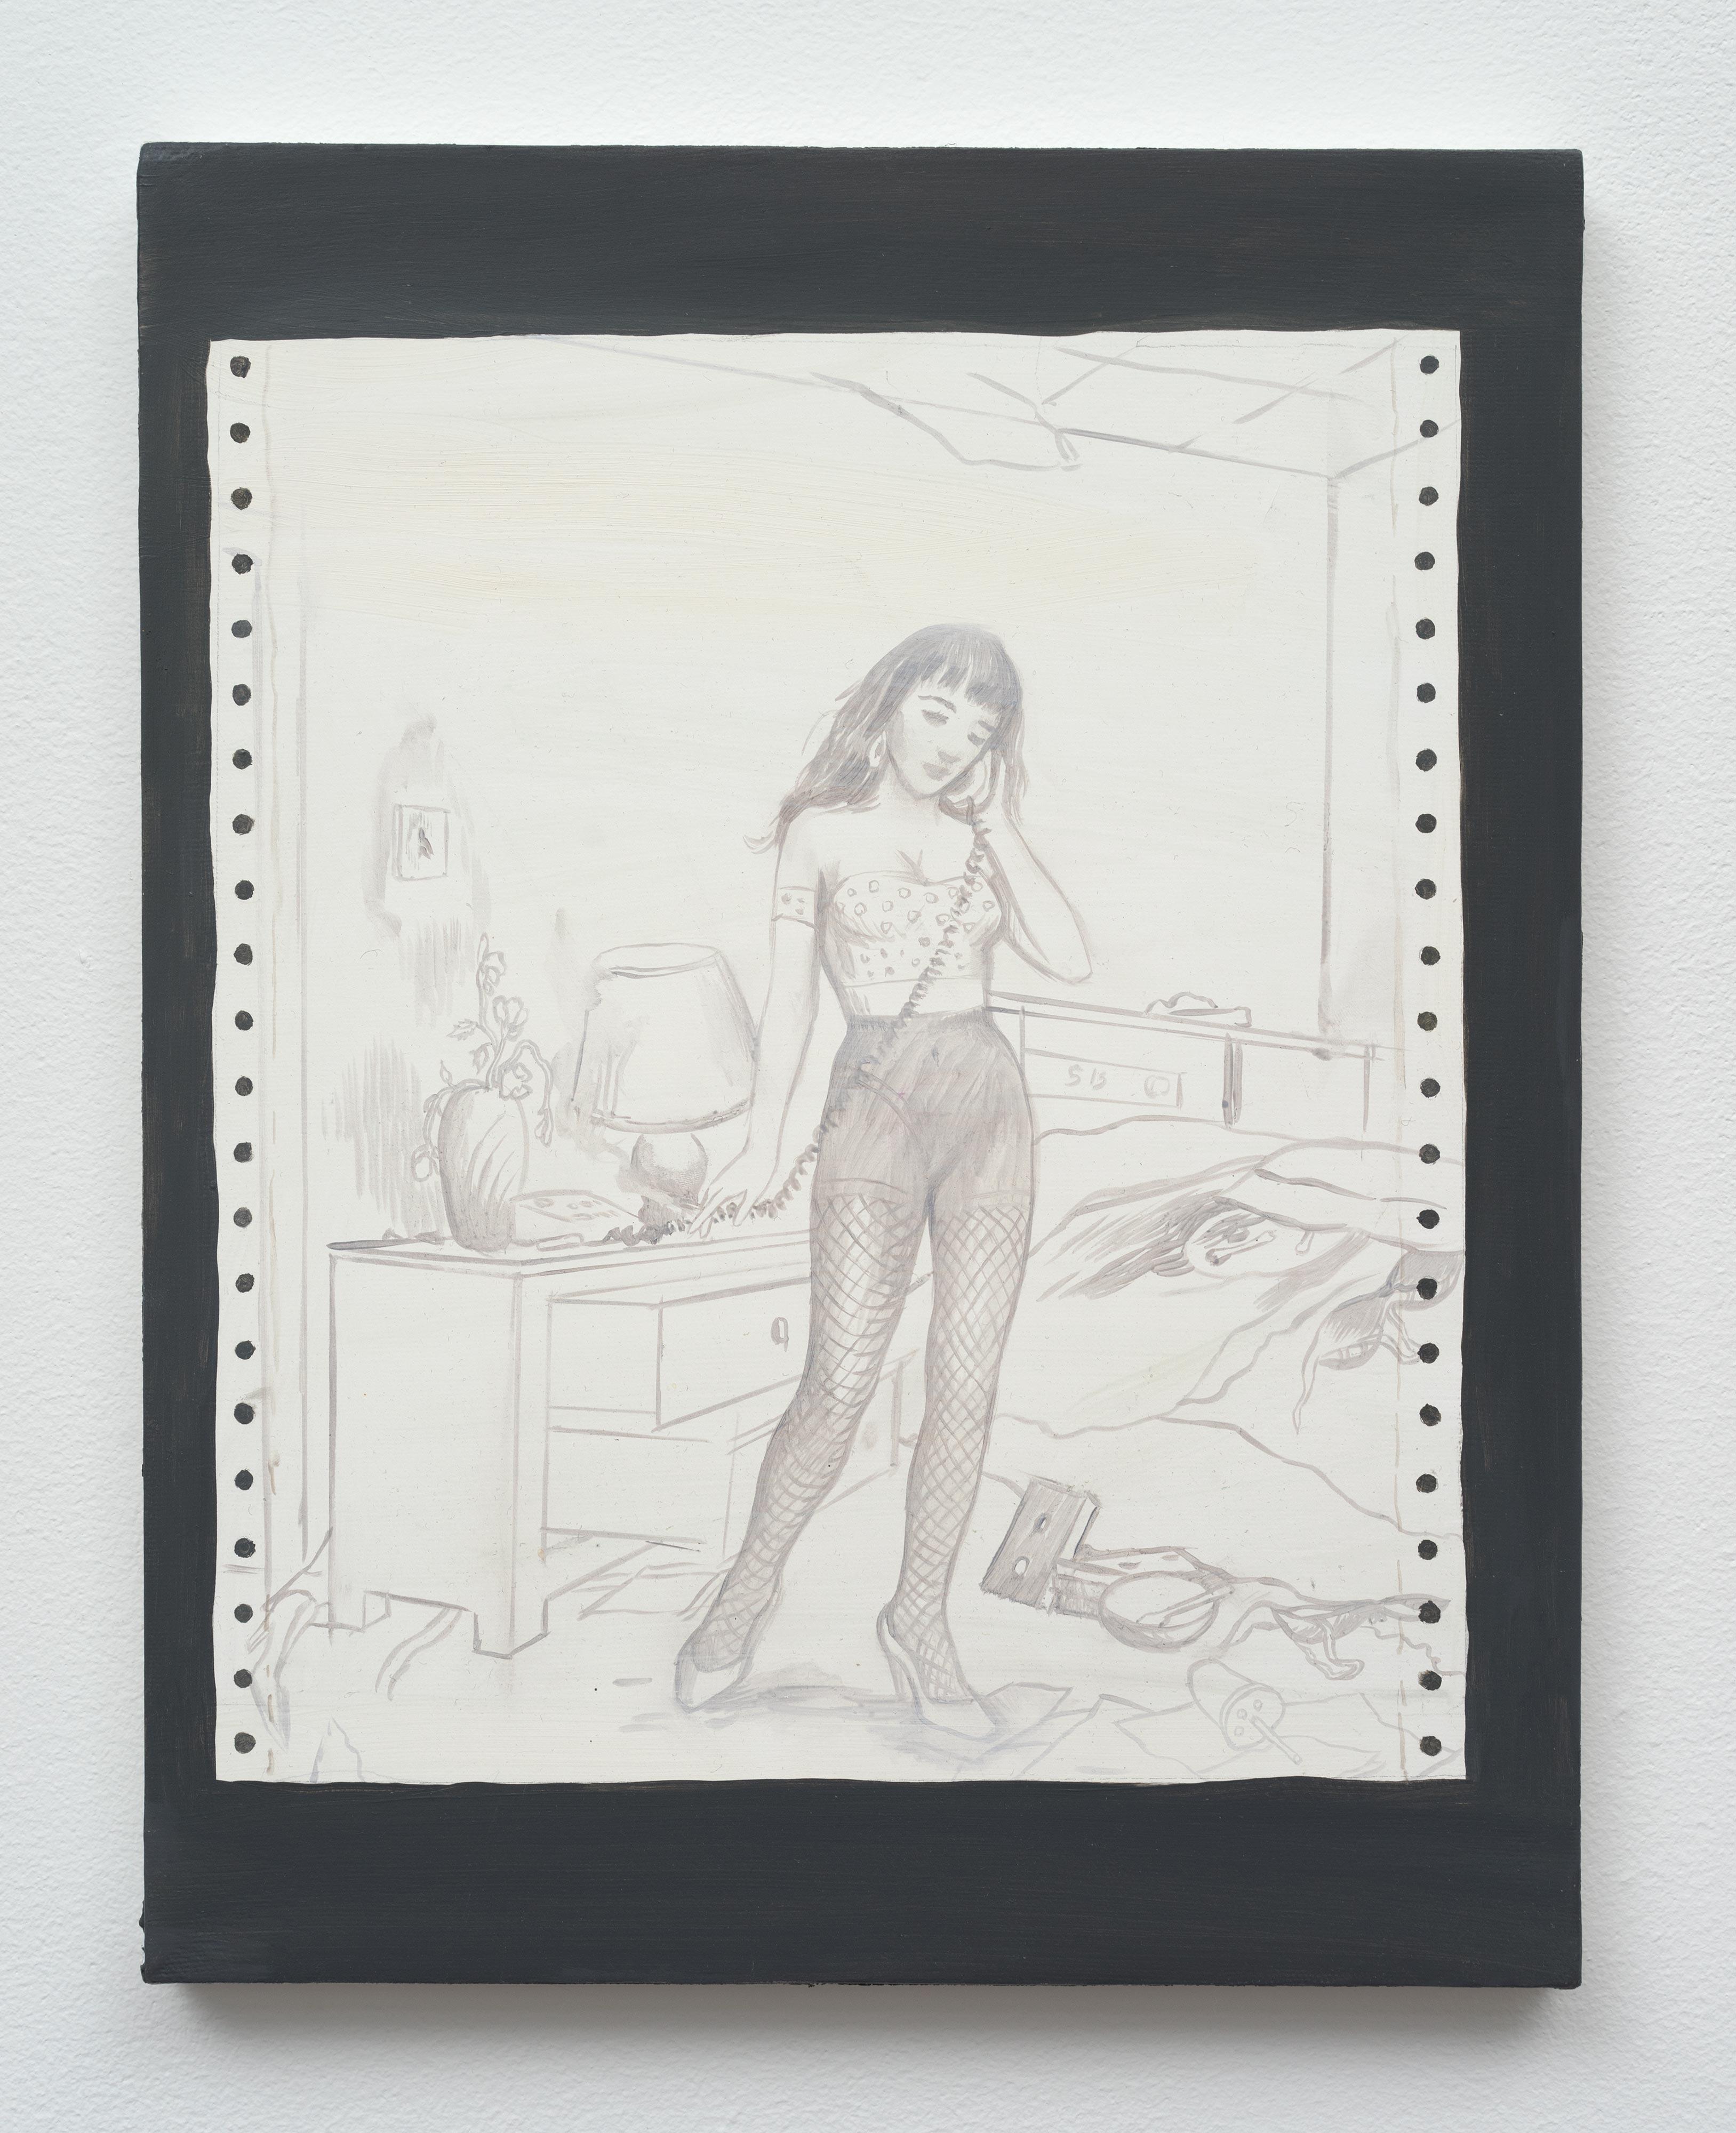 Brandi Twilley<br>Fish Nets<br>2014<br>oil on canvas<br>14 x 11 in (35.56 x 27.94 cm)